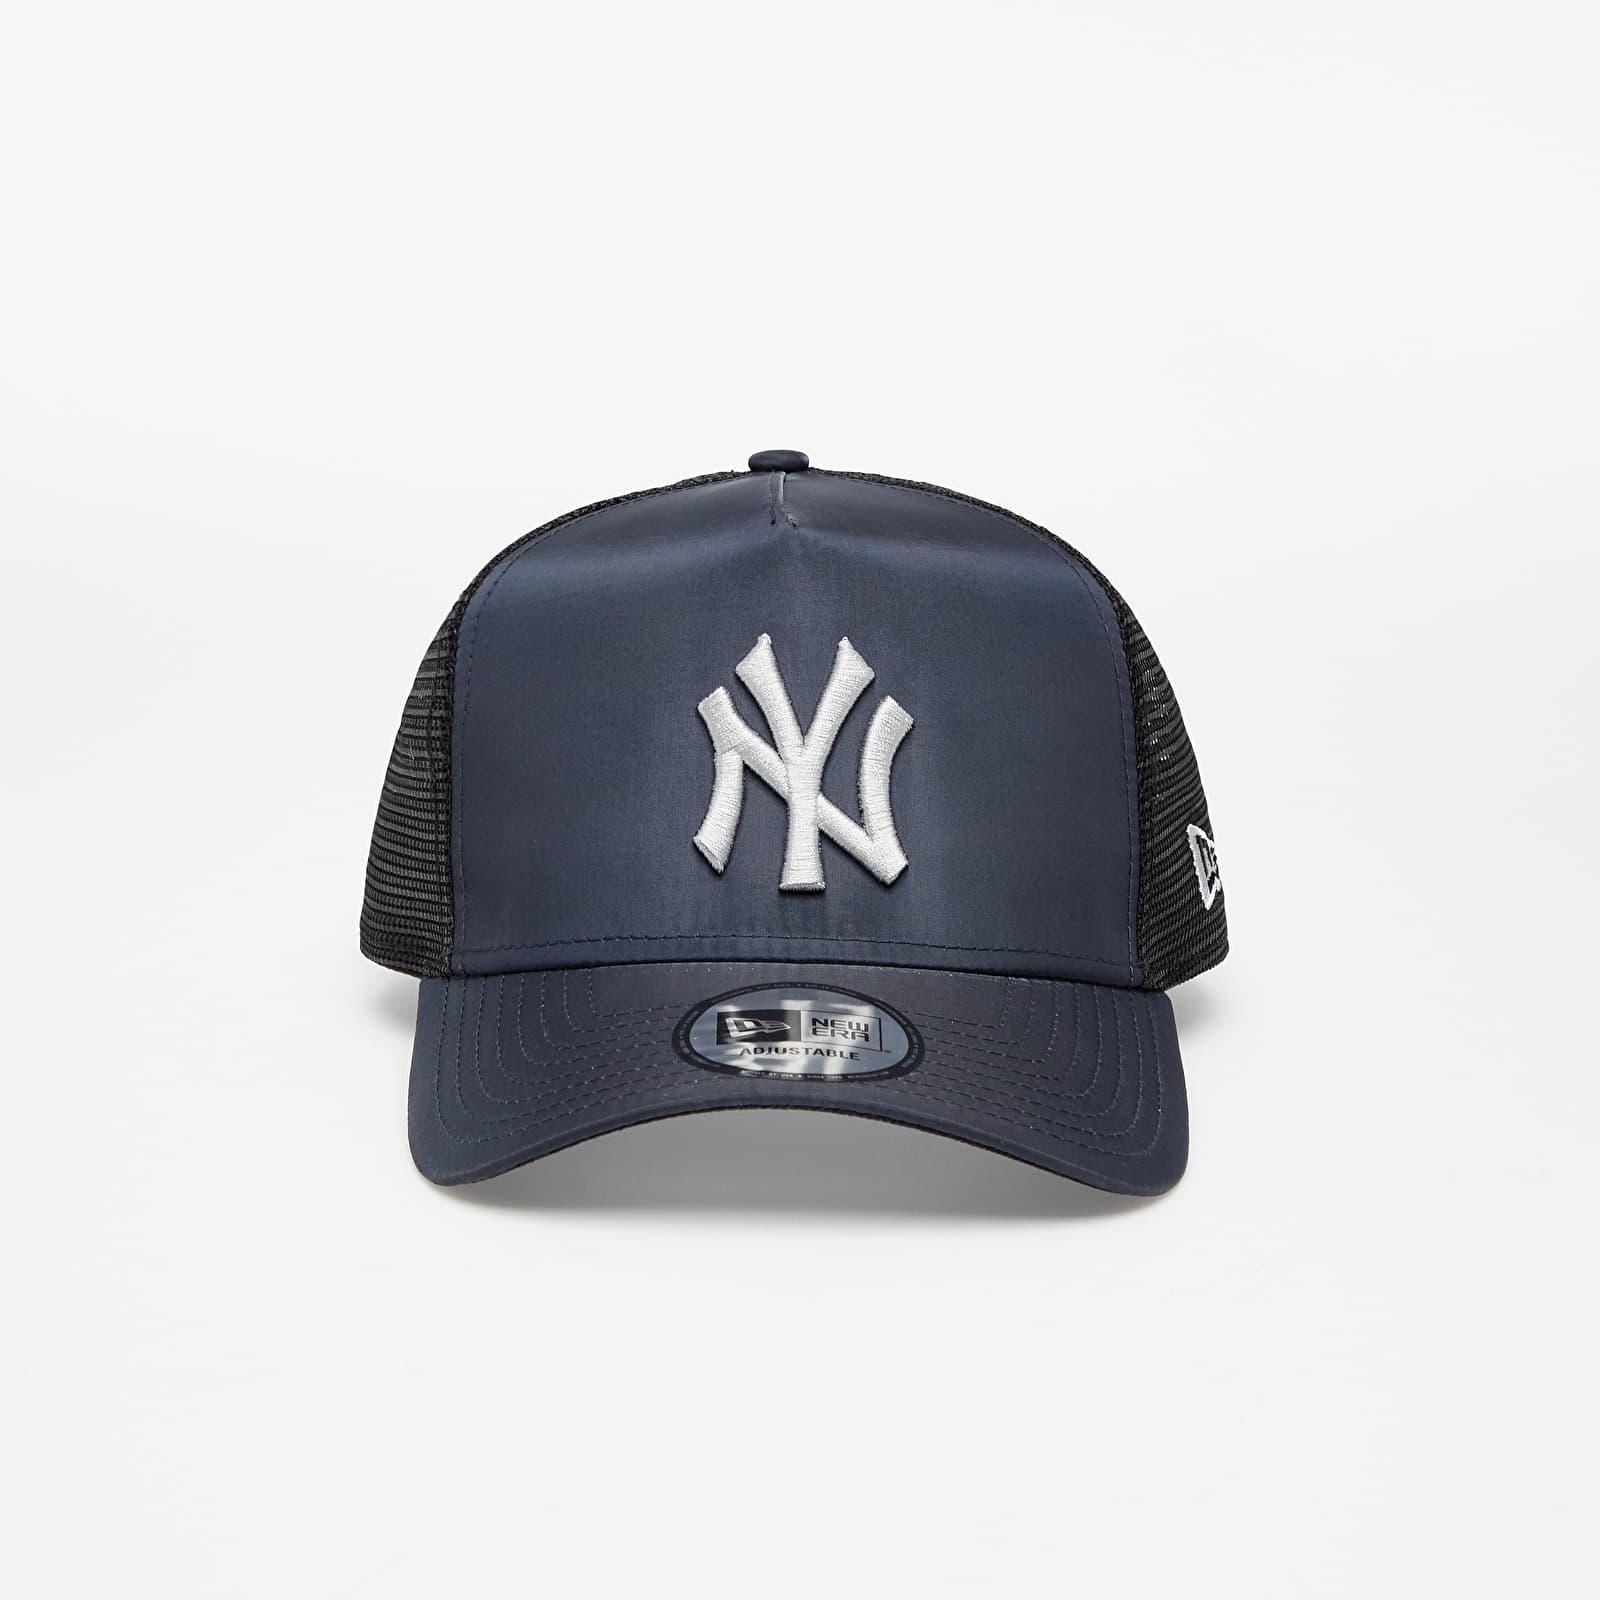 New Era Cap 940 Af Trucker MLB Hypertone Trucker New York Yankees Black EUR